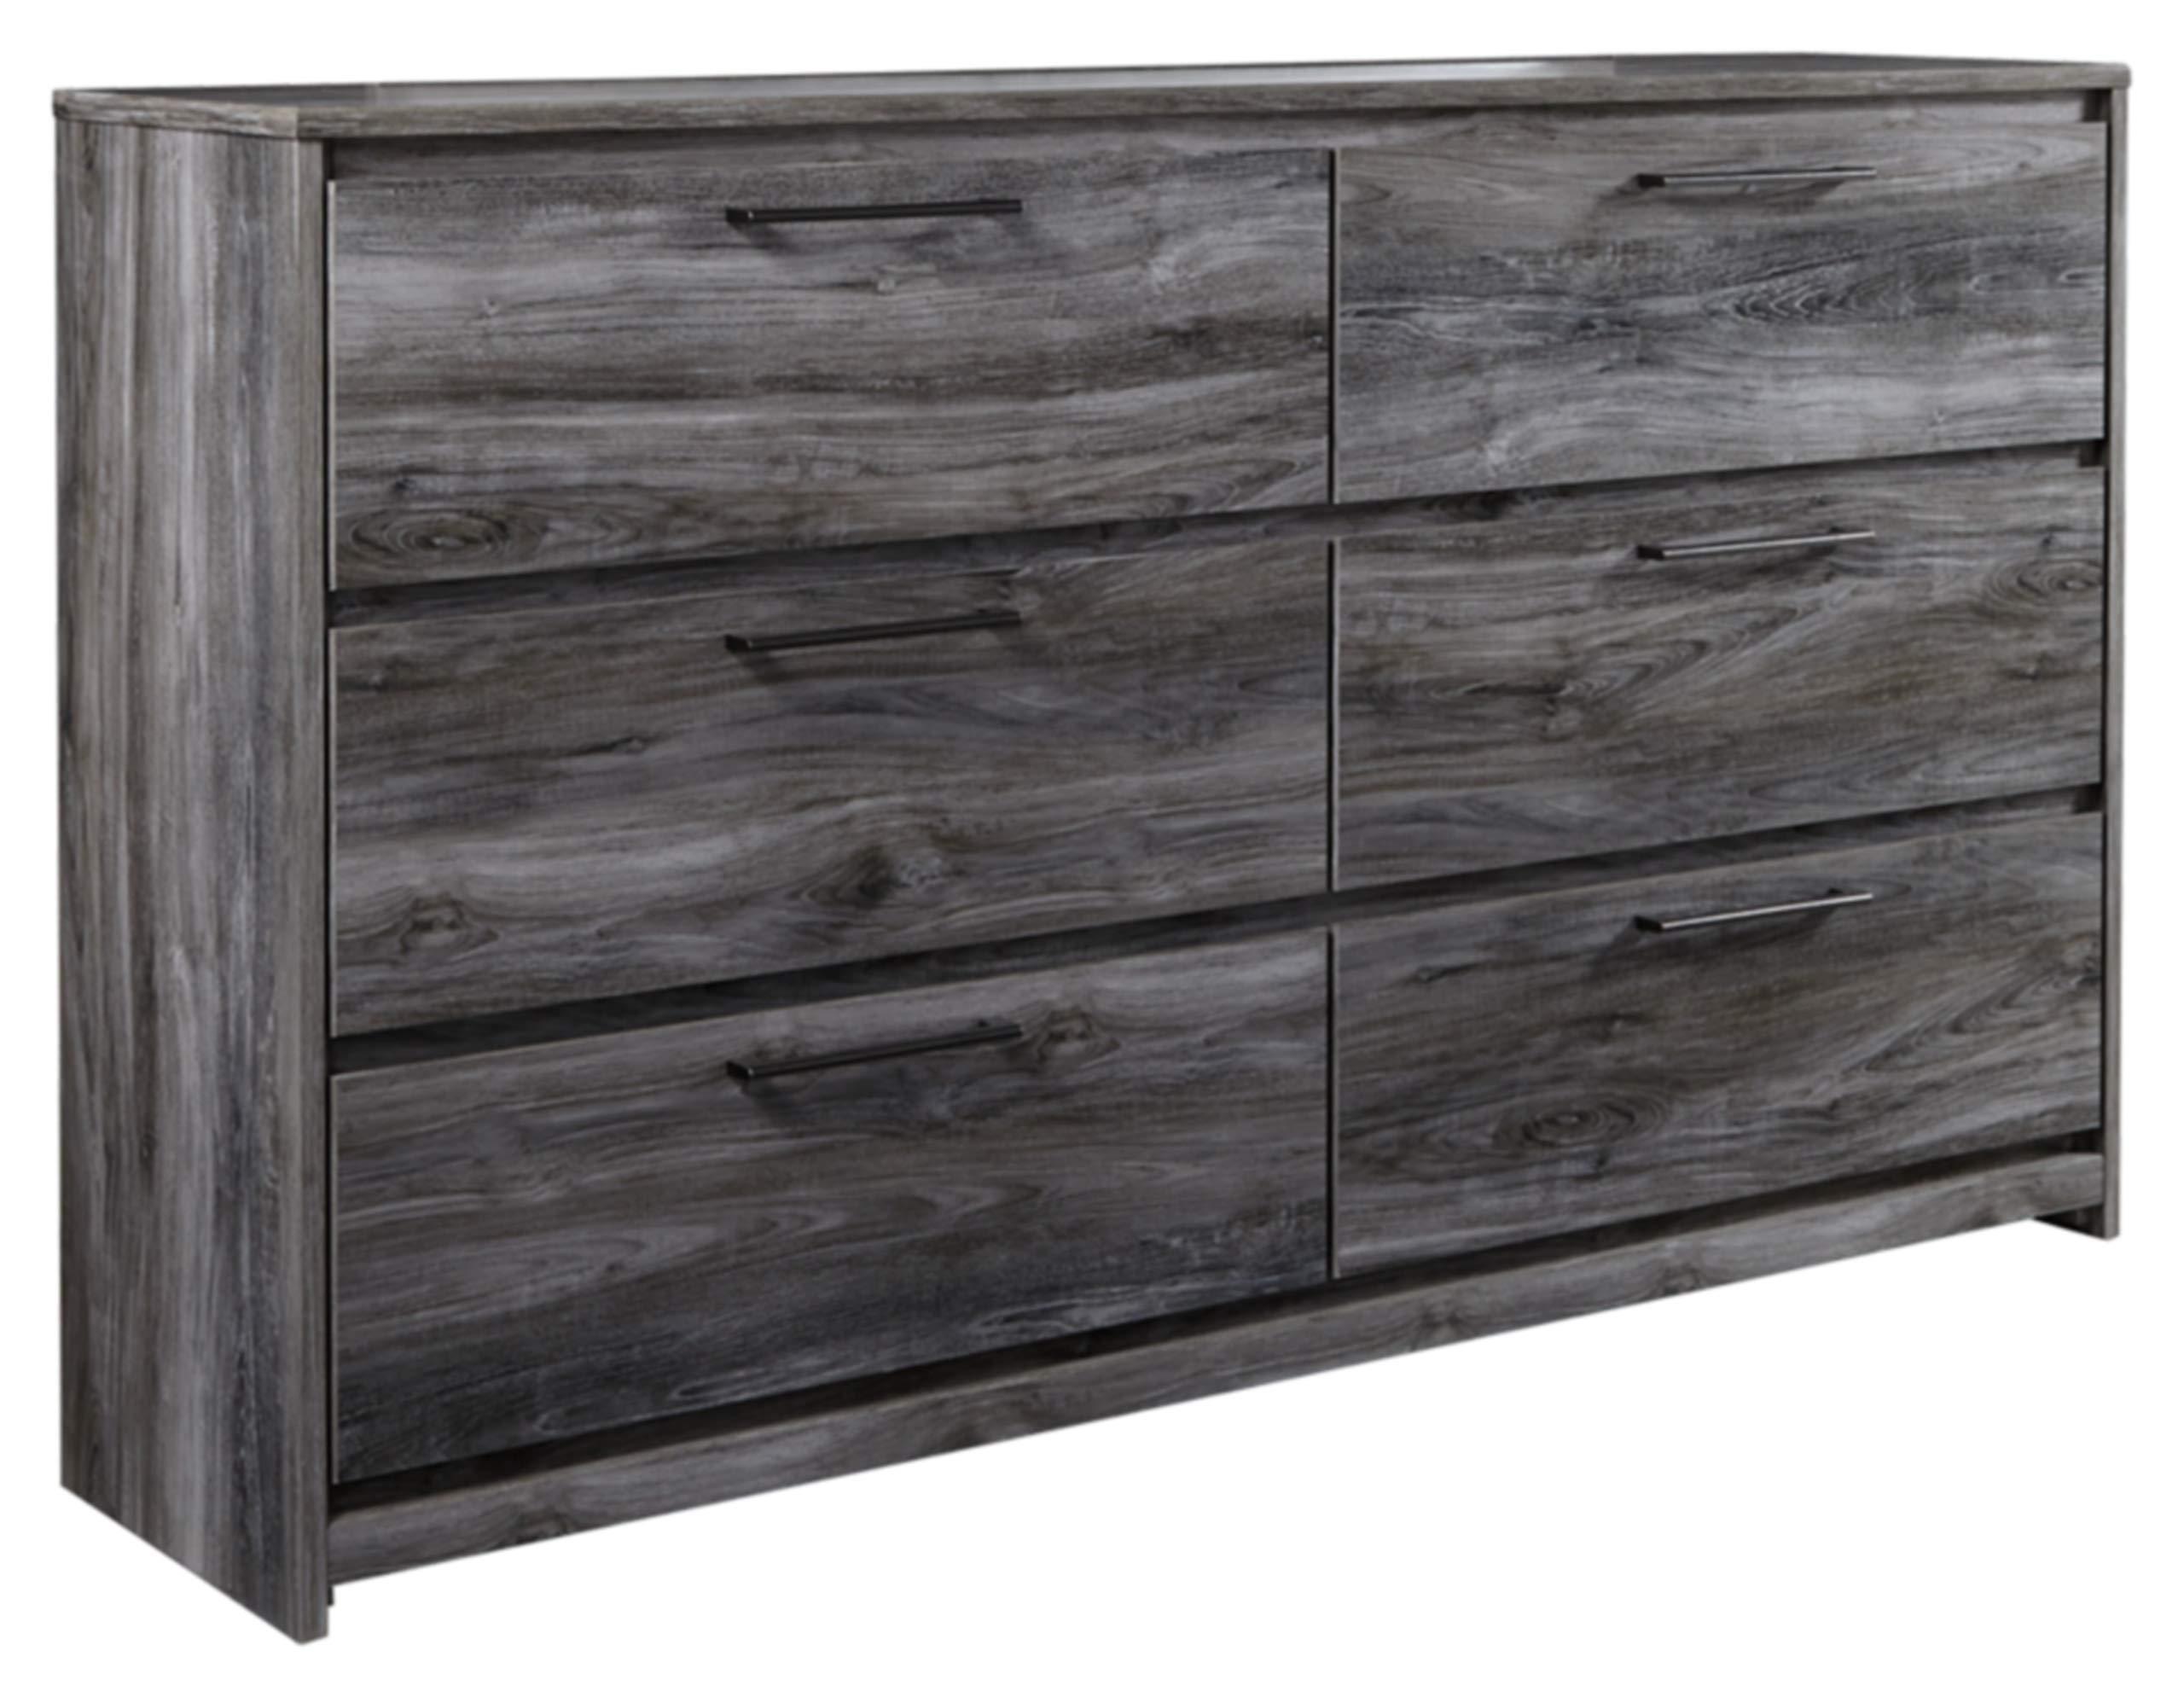 Signature Design by Ashley B221-31 Baystorm Dressers, Gray